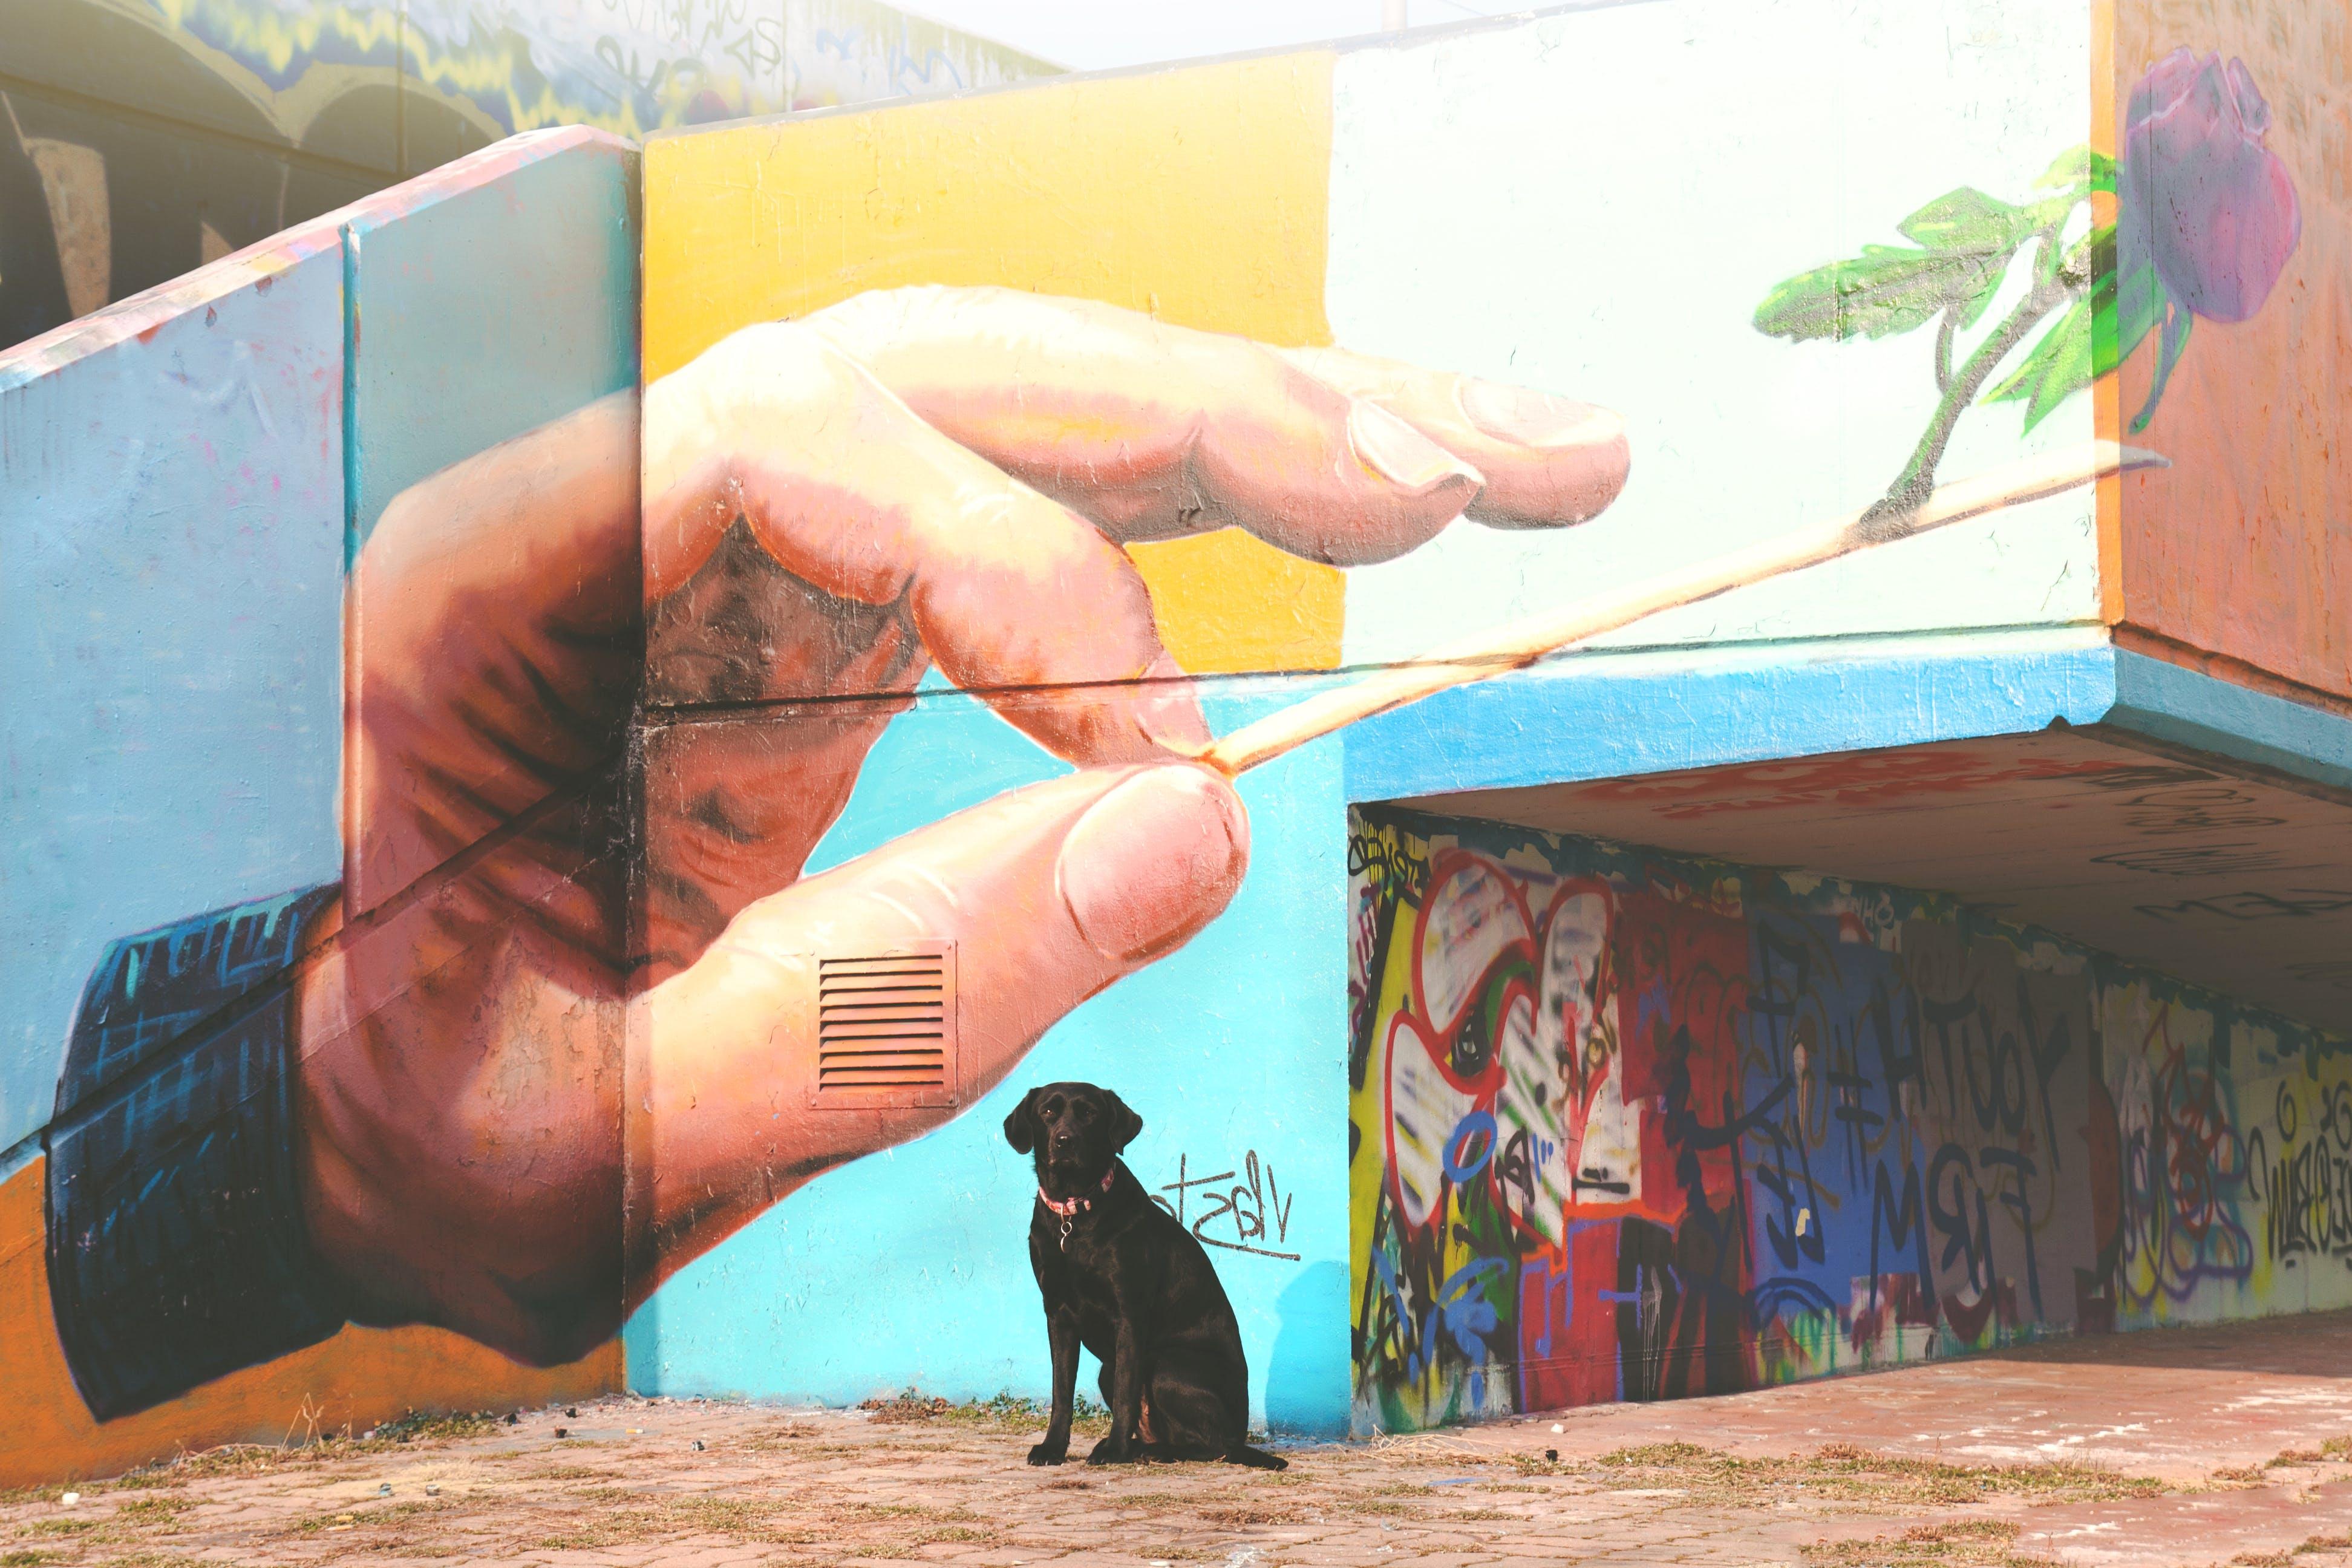 Short-coated Black Dog Sitting Near Wall Arts